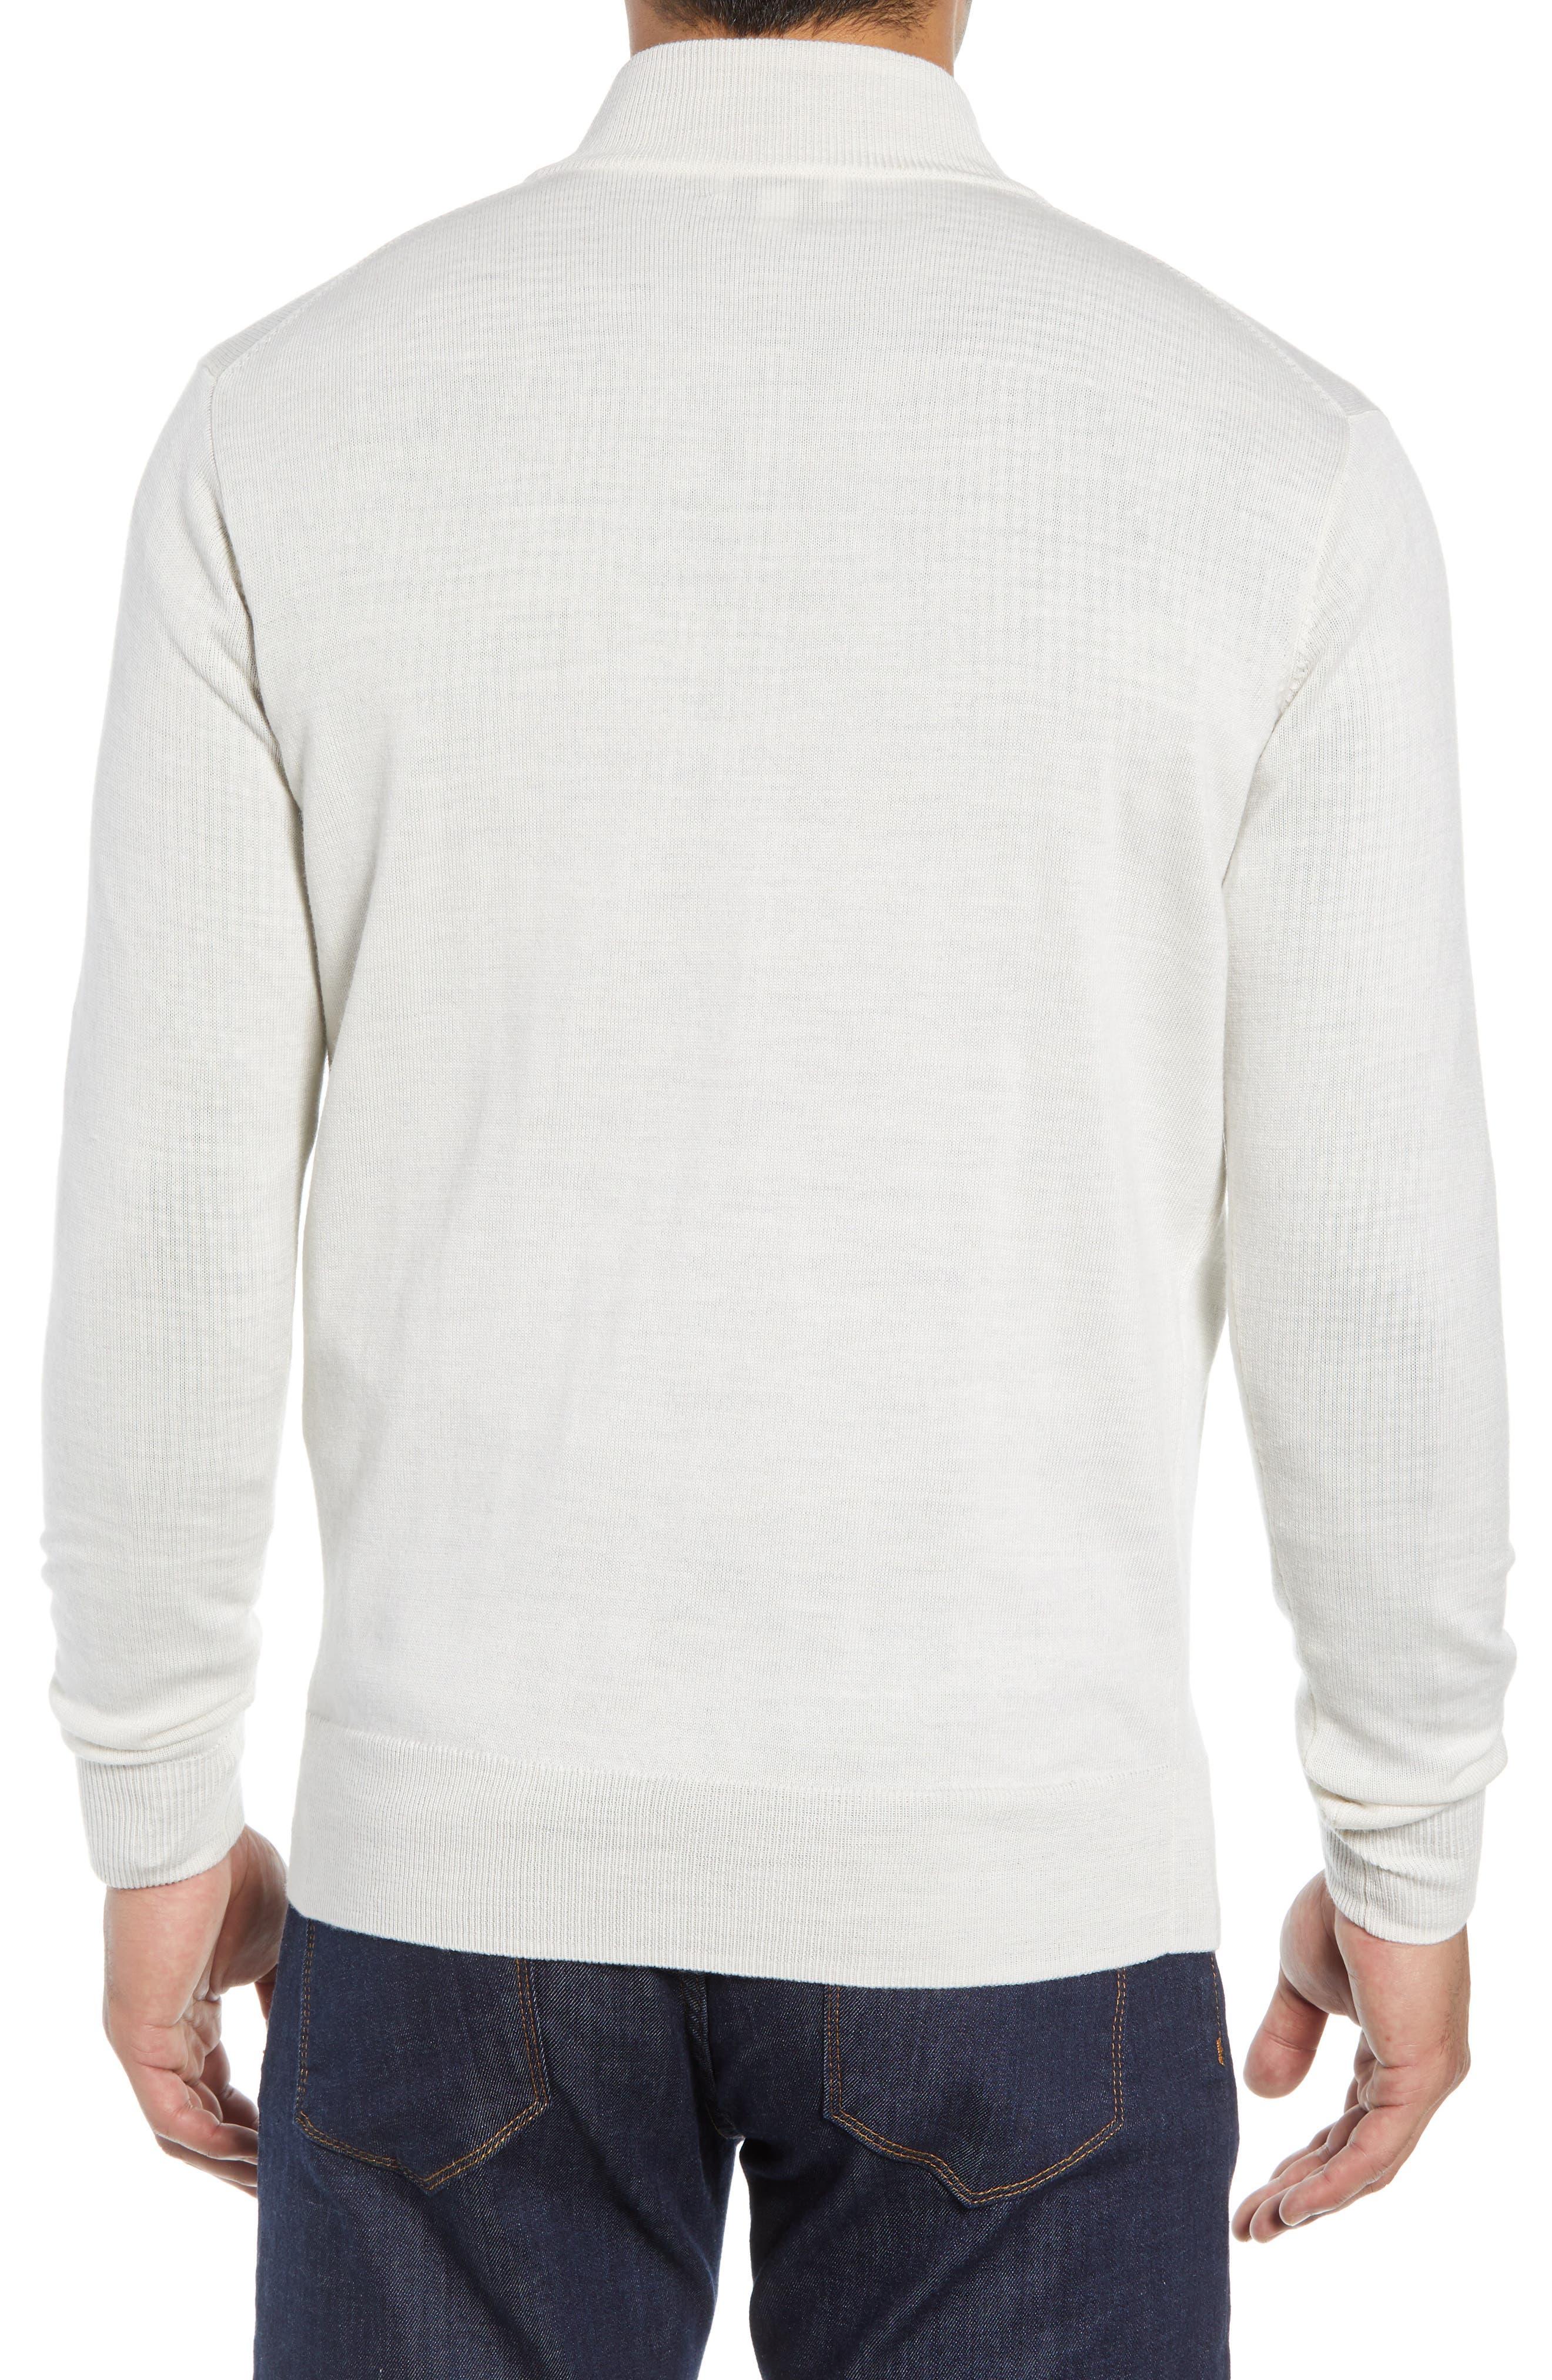 Crown Soft Regular Fit Wool Blend Quarter Zip Sweater,                             Alternate thumbnail 2, color,                             WHITE